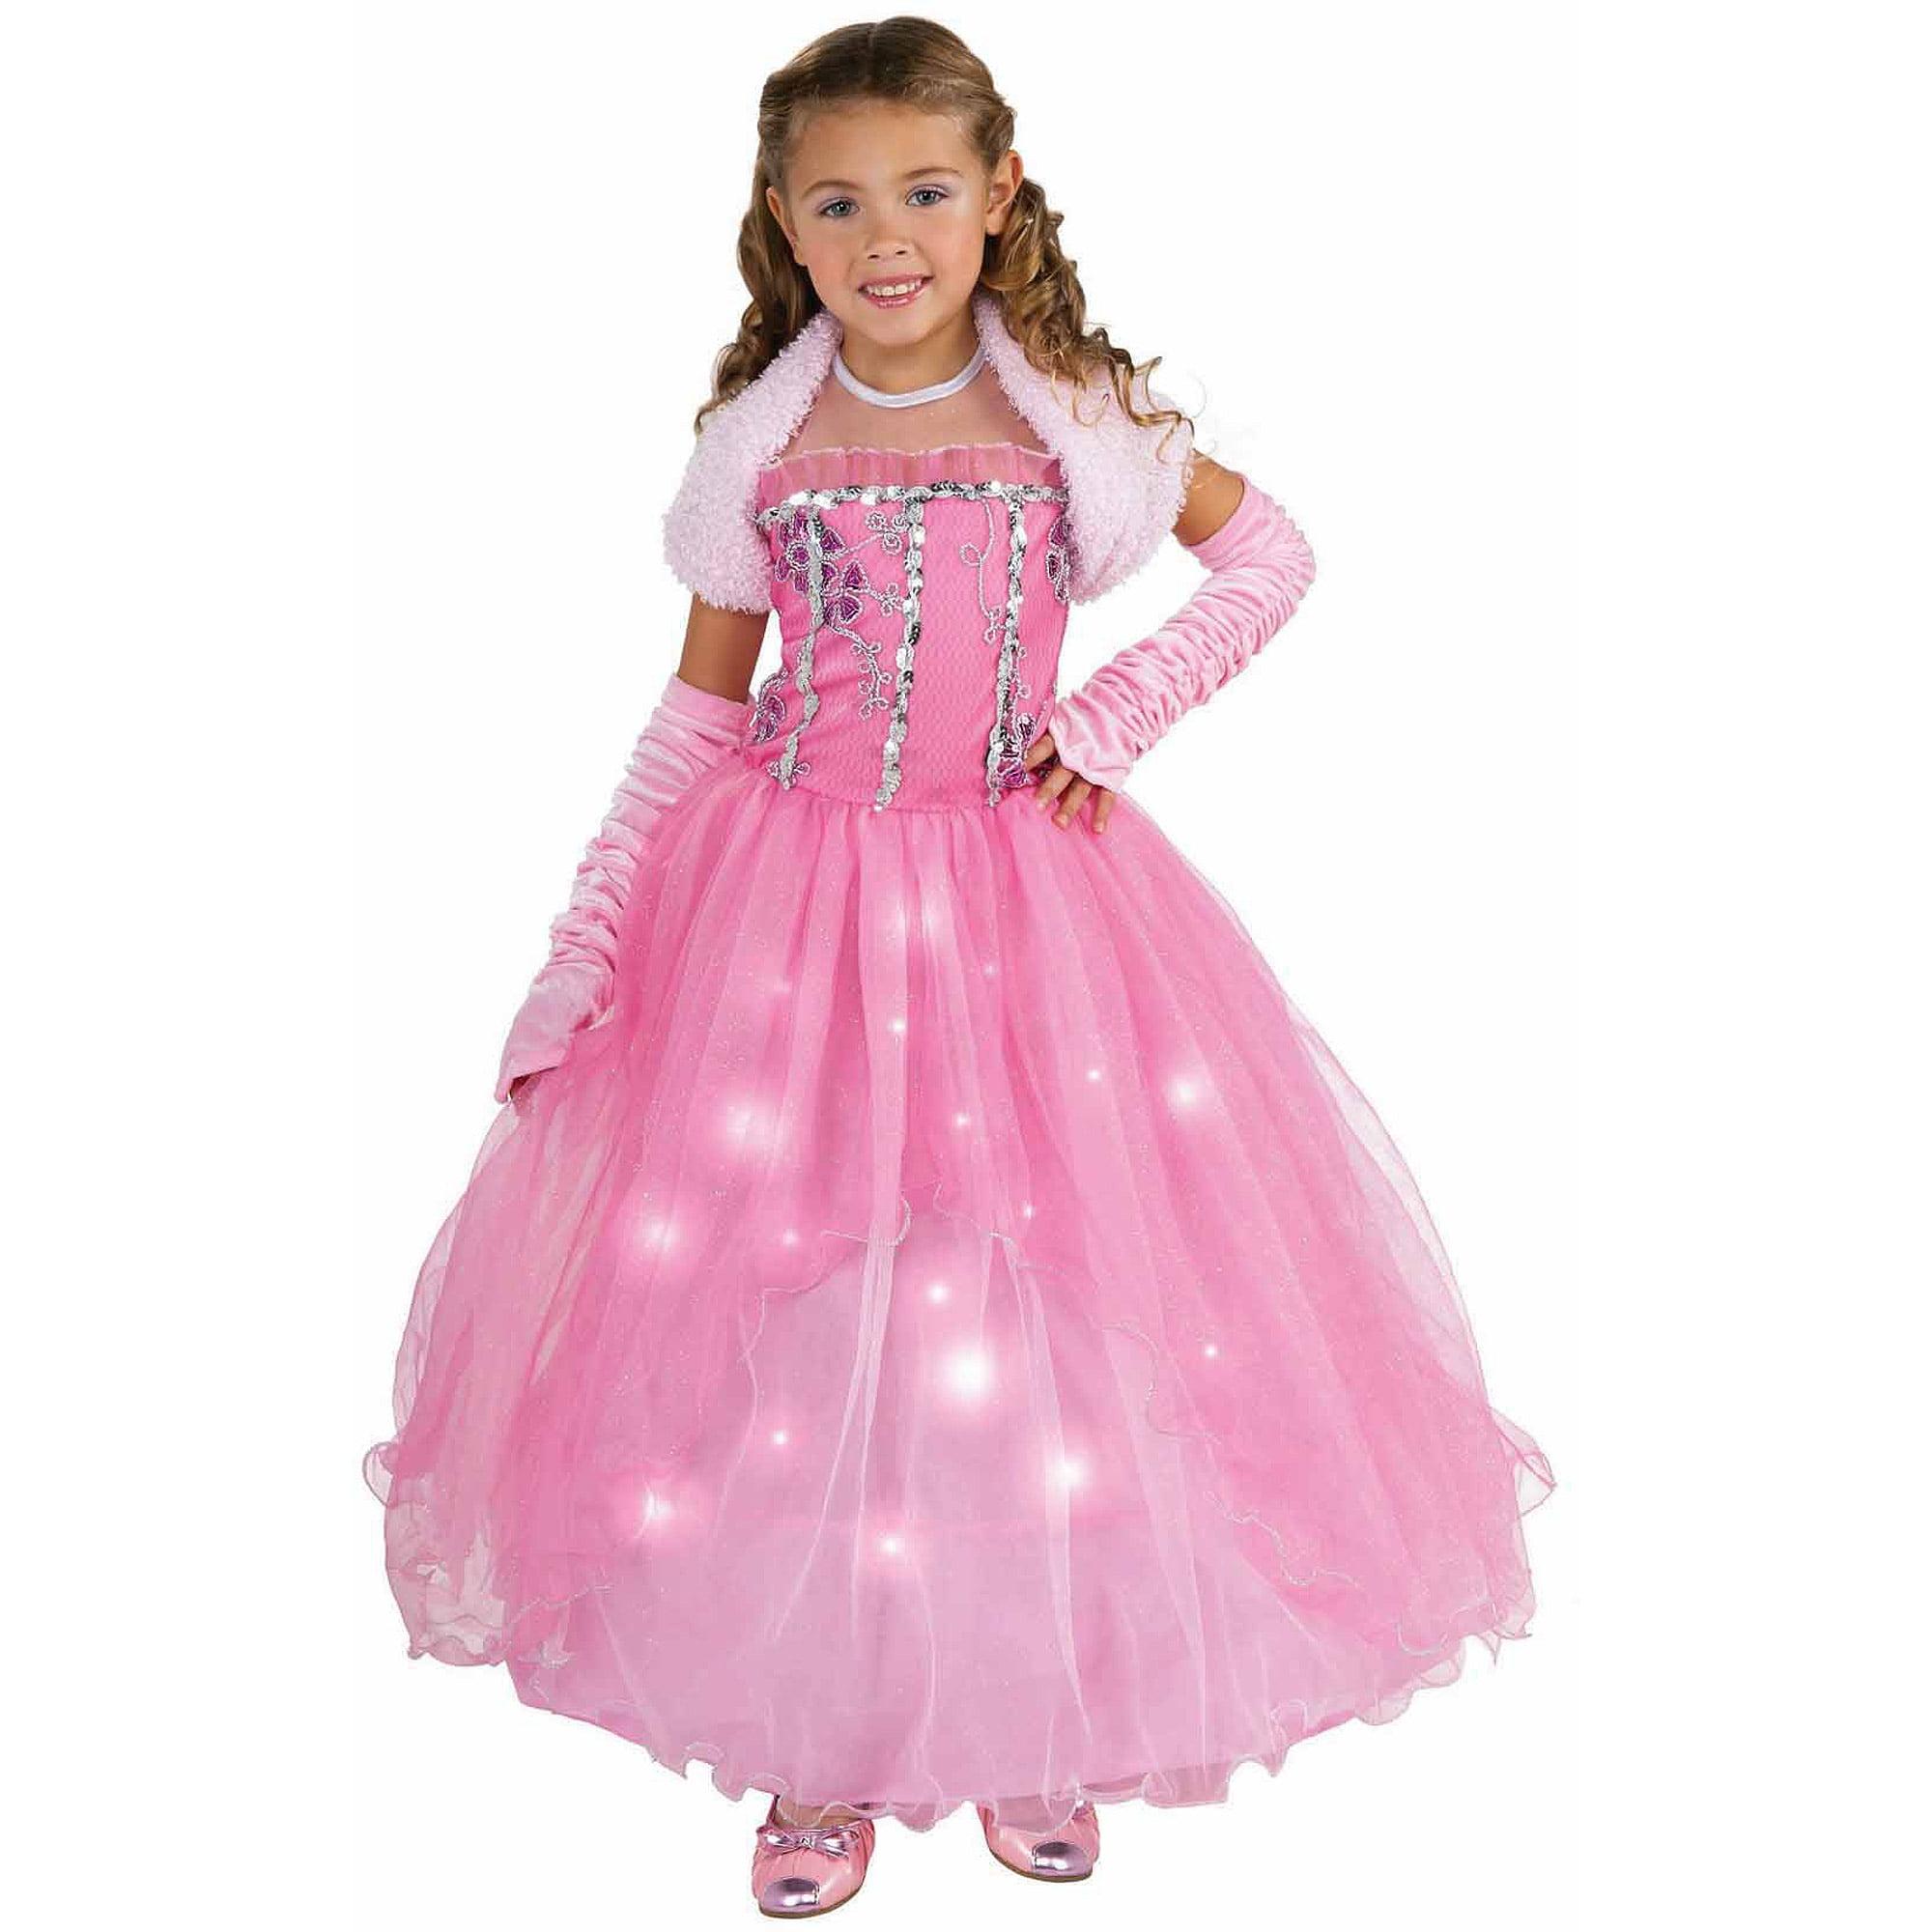 pretty pink princess girls halloween costume - Halloween Princess Costumes For Toddlers